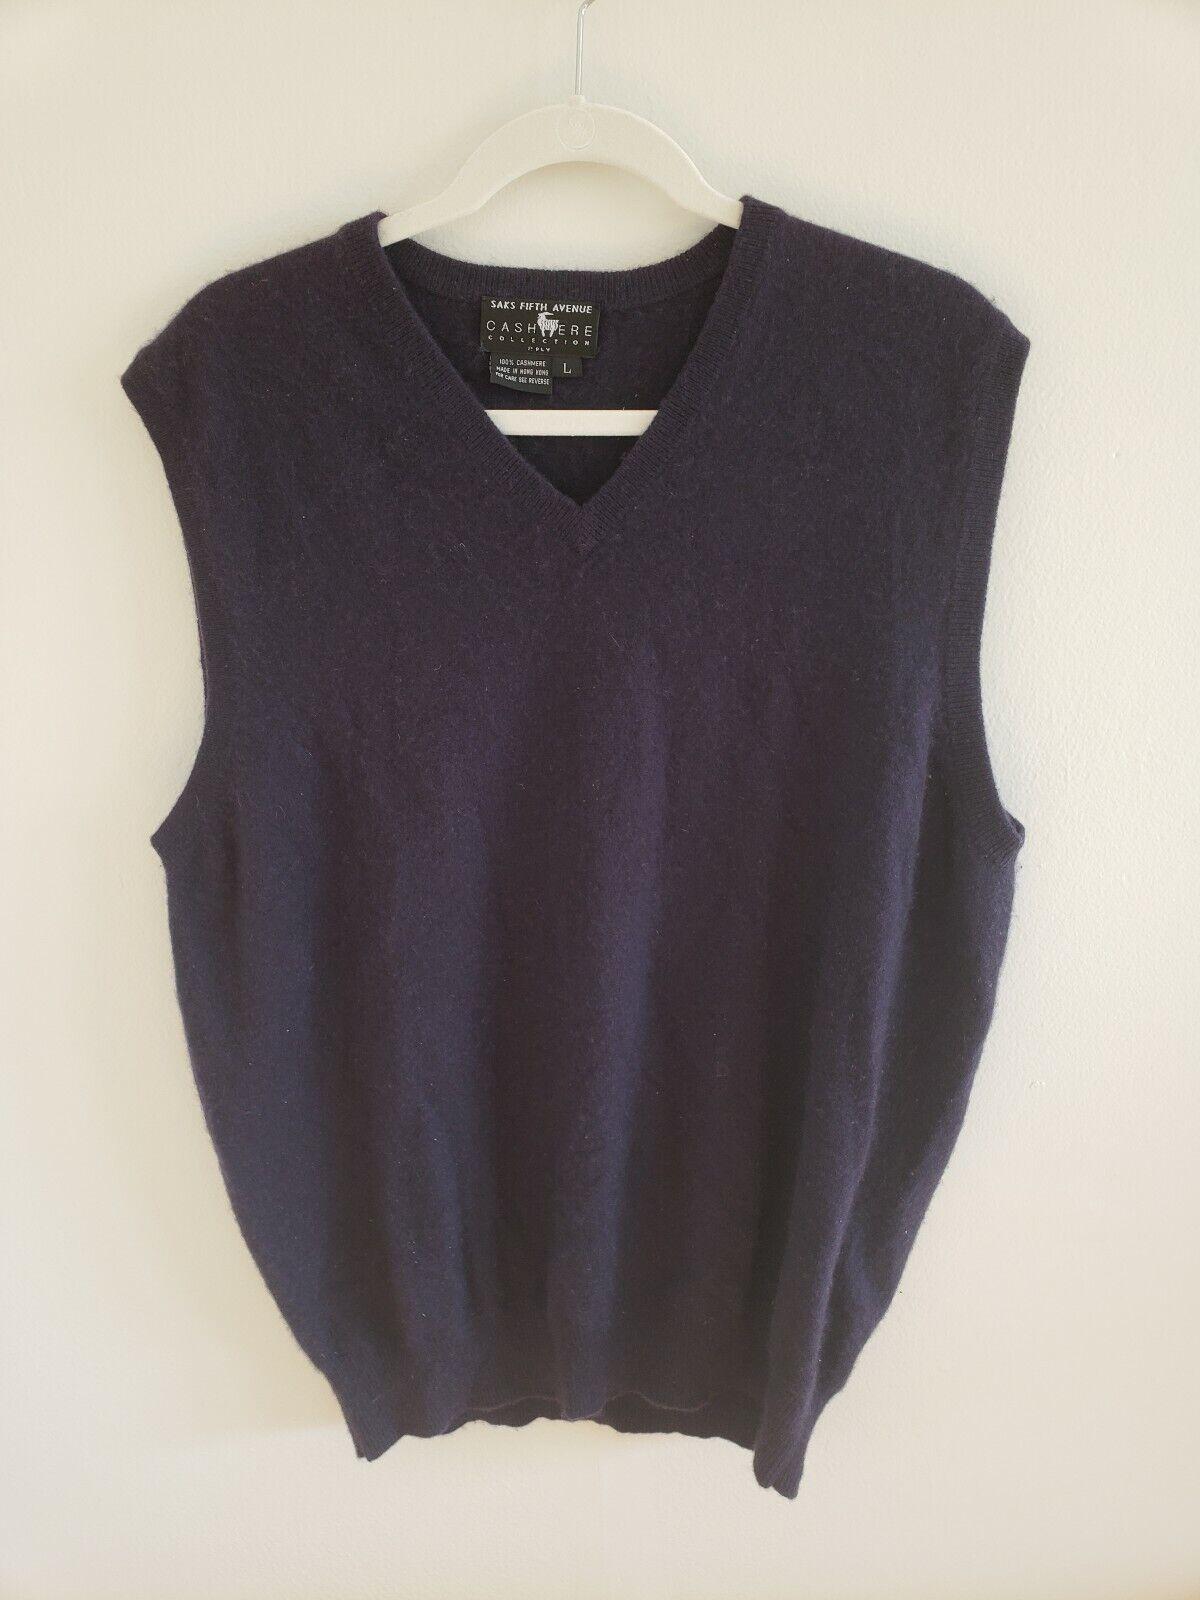 Vintage Mens SAKS FIFTH AVENUE 100% Pure Cashmere Sweater Vest Navy bluee Large L